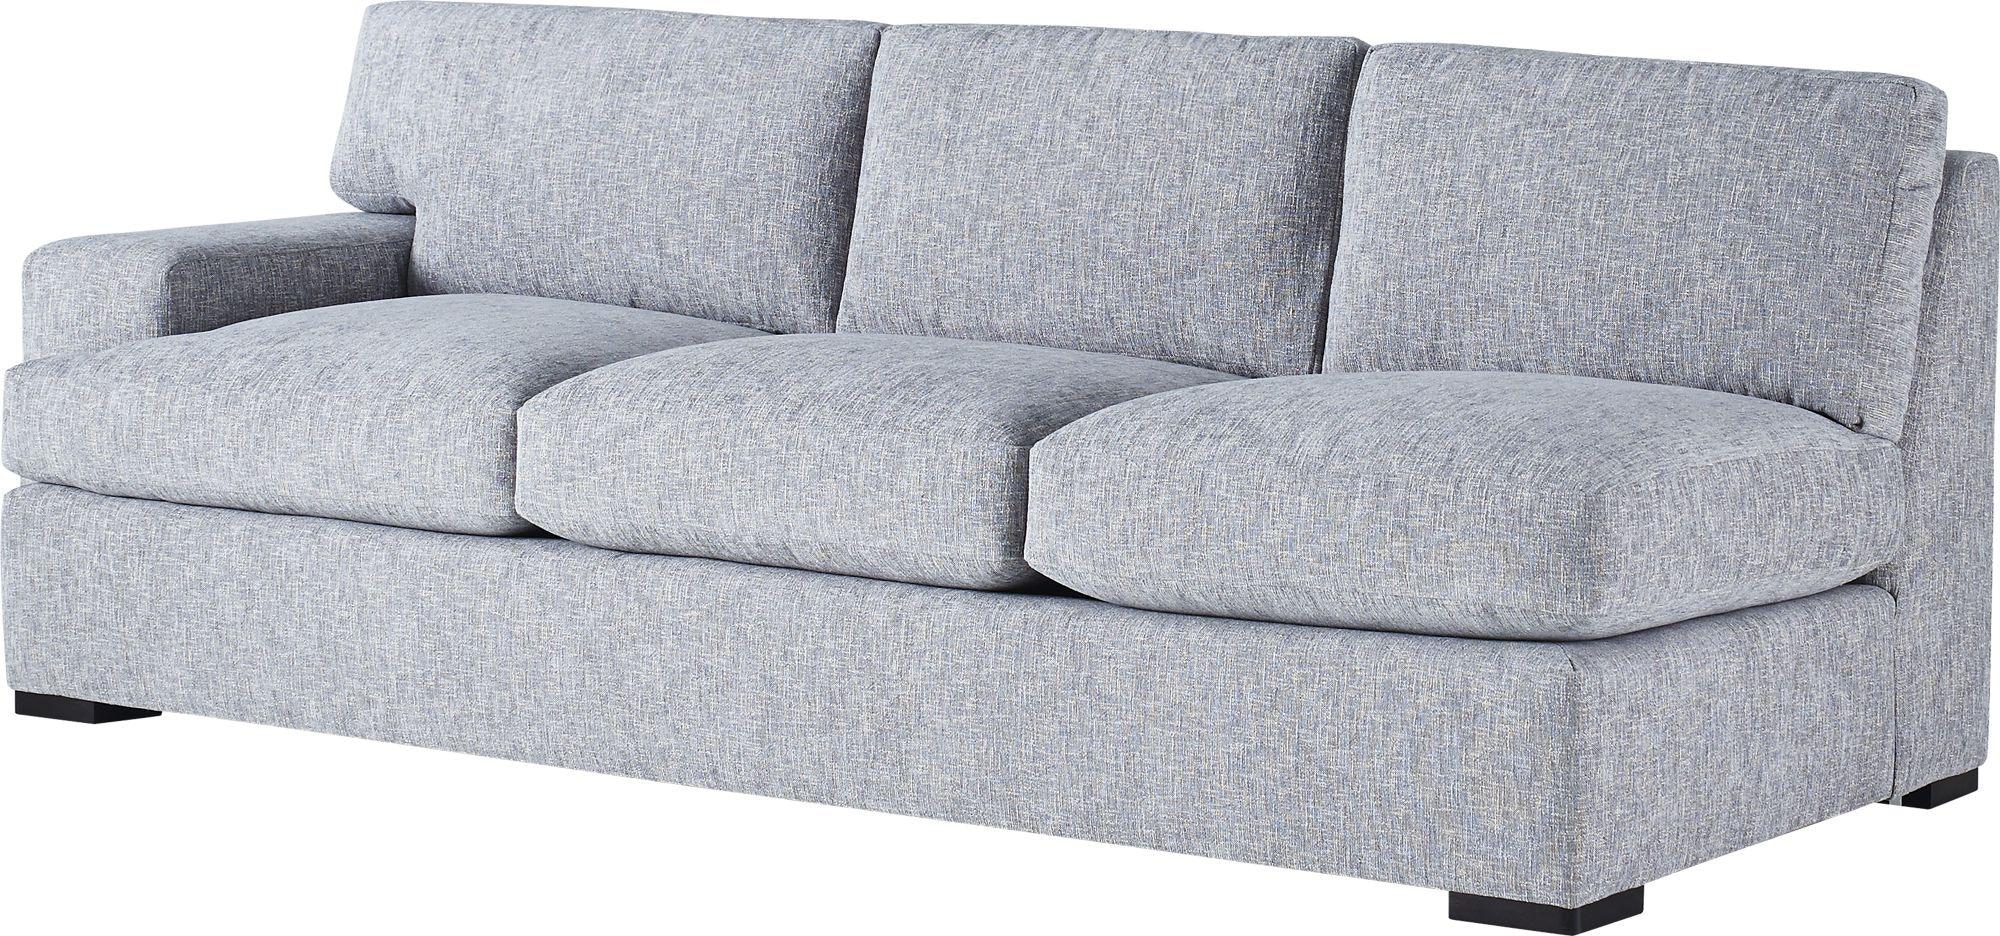 baker furniture jean louis deniot moonstone one arm sofa loose back 6181so1